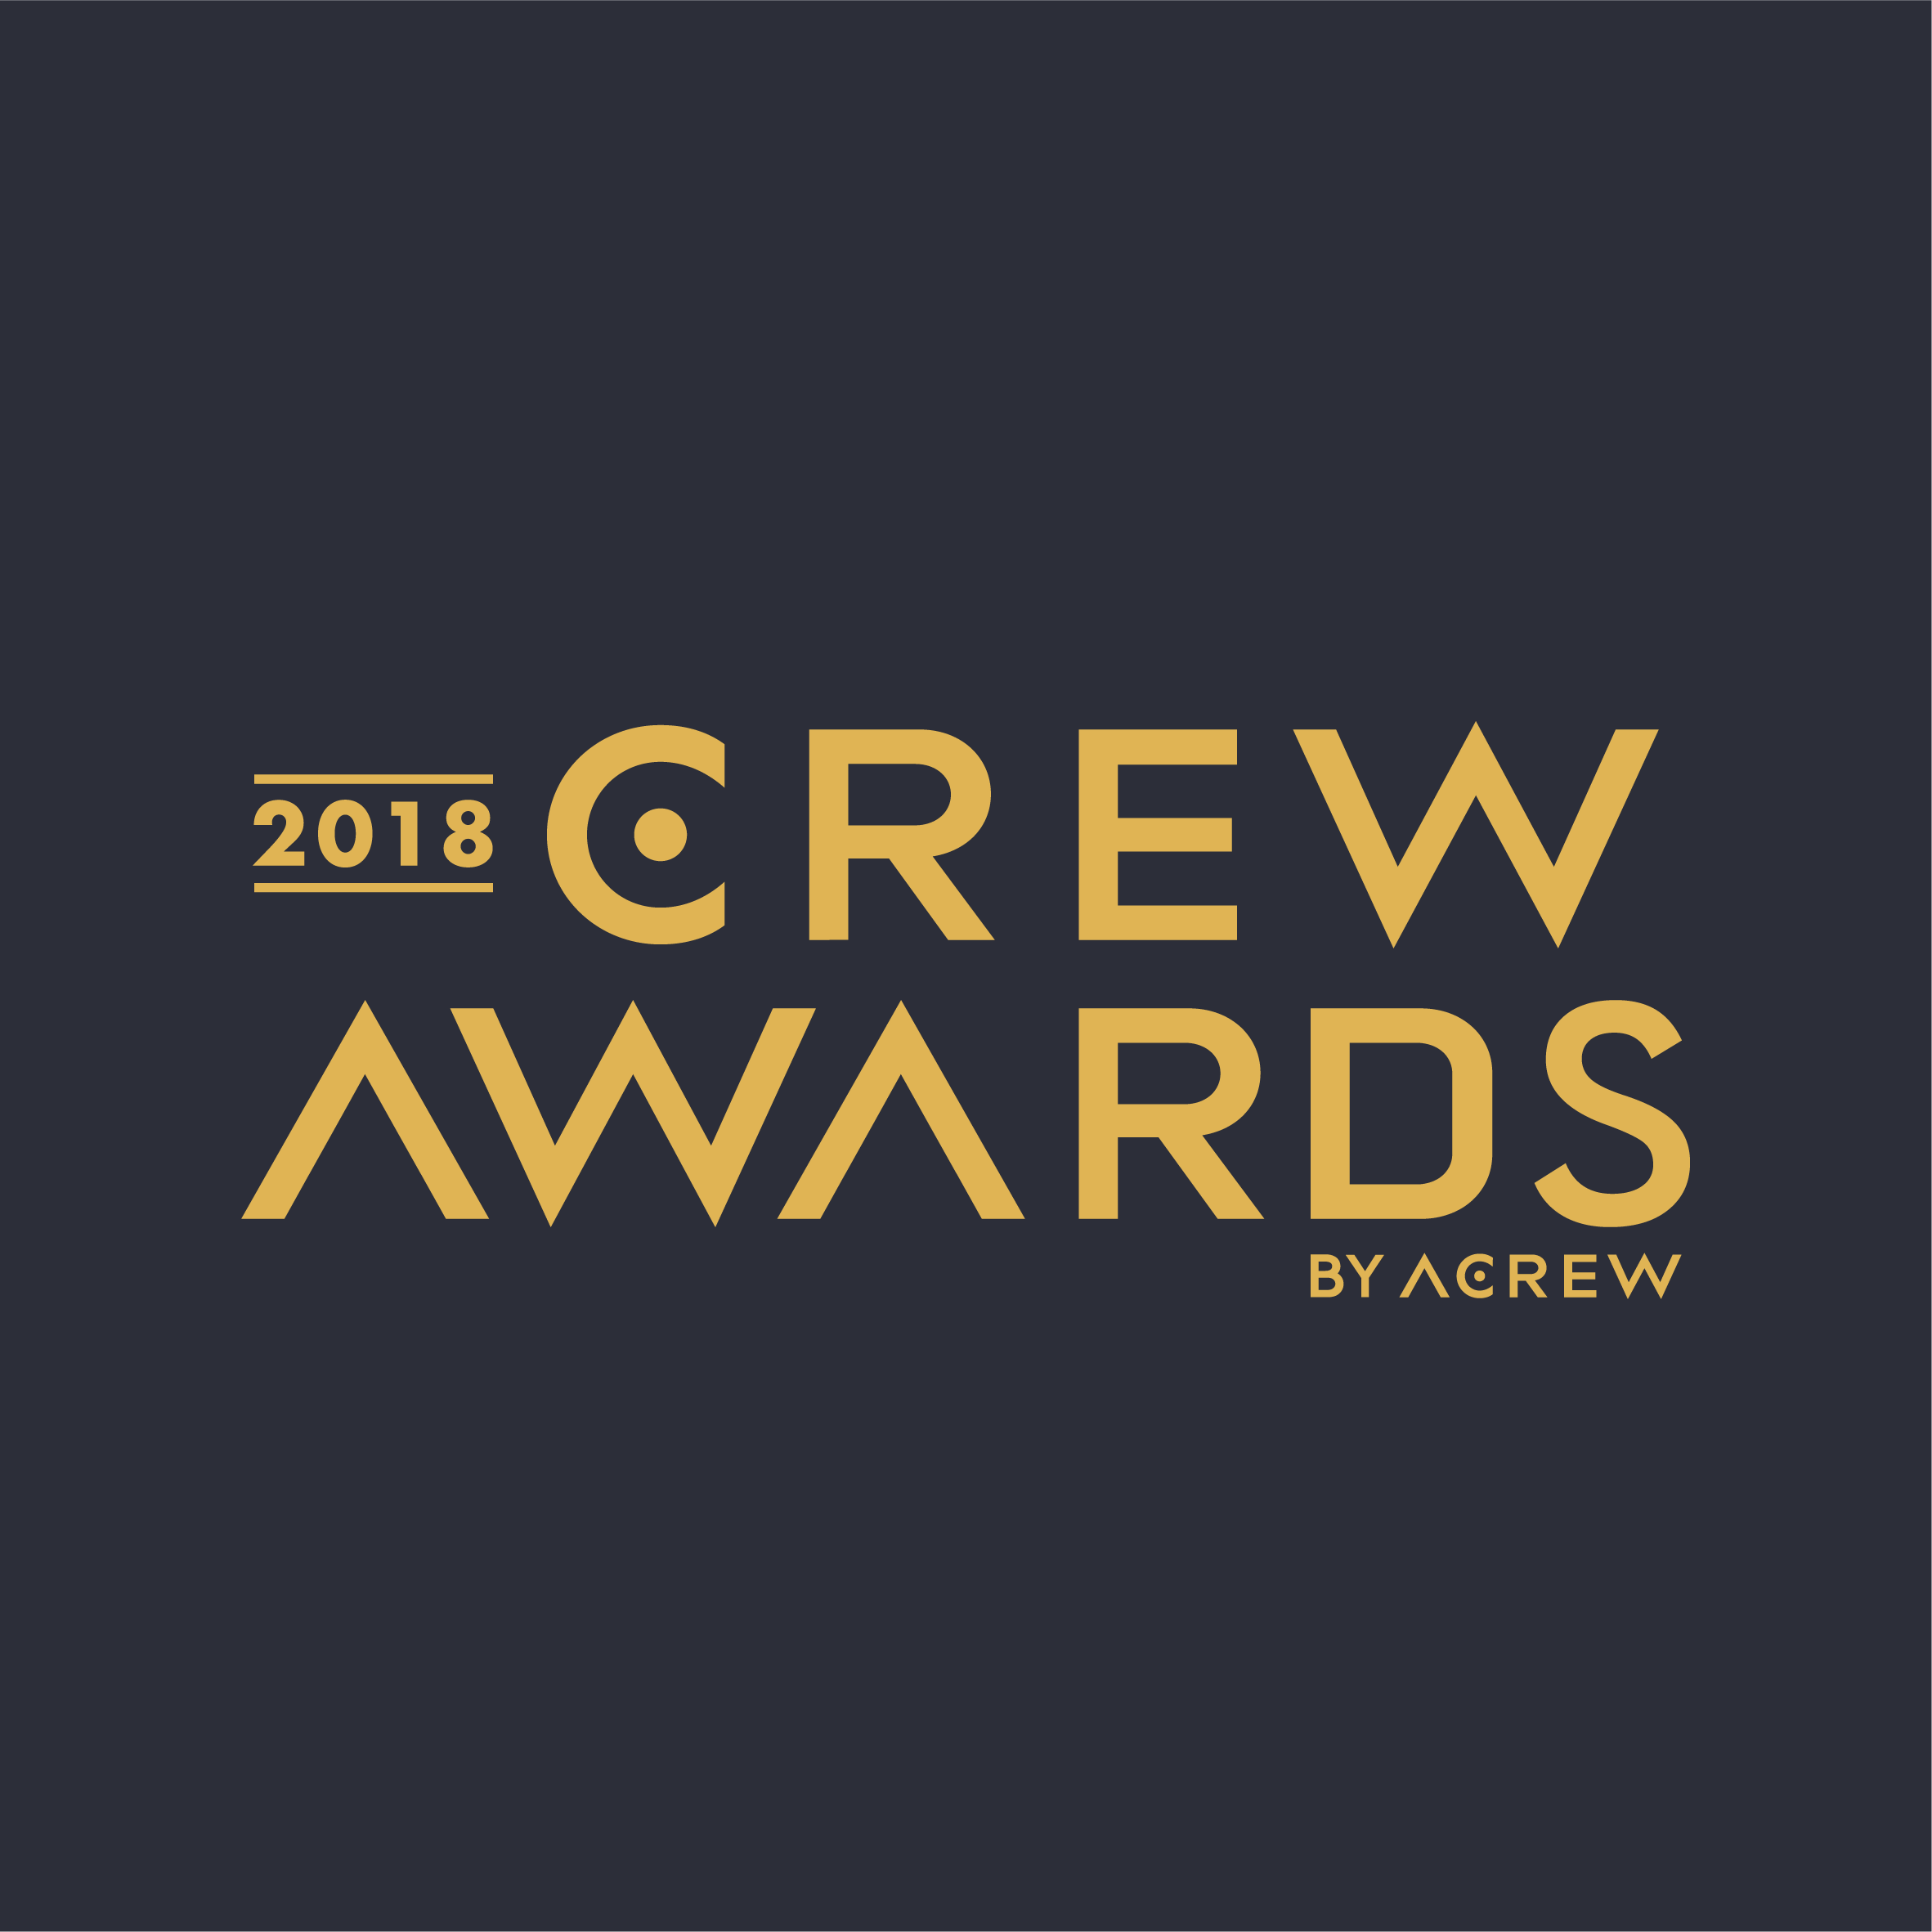 The first international Crew Awards 2018